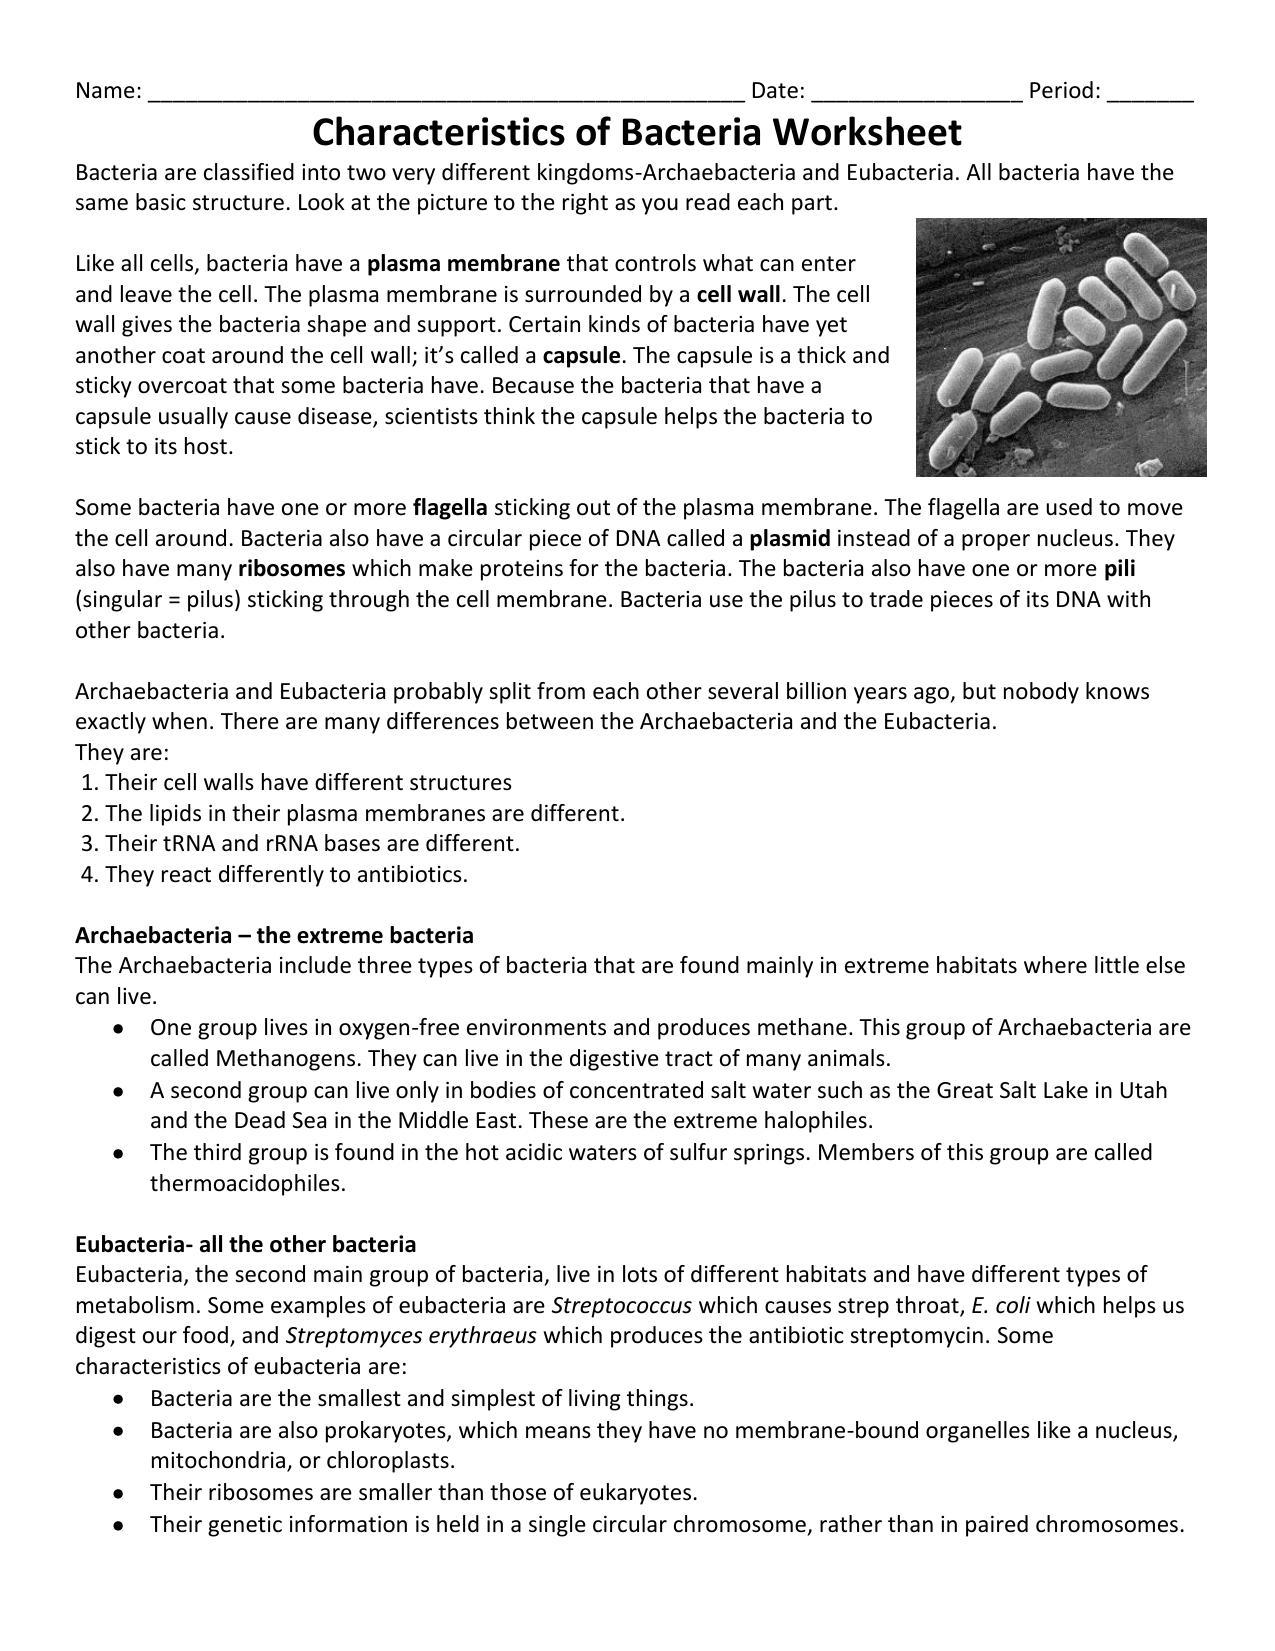 Characteristics of Bacteria Worksheet